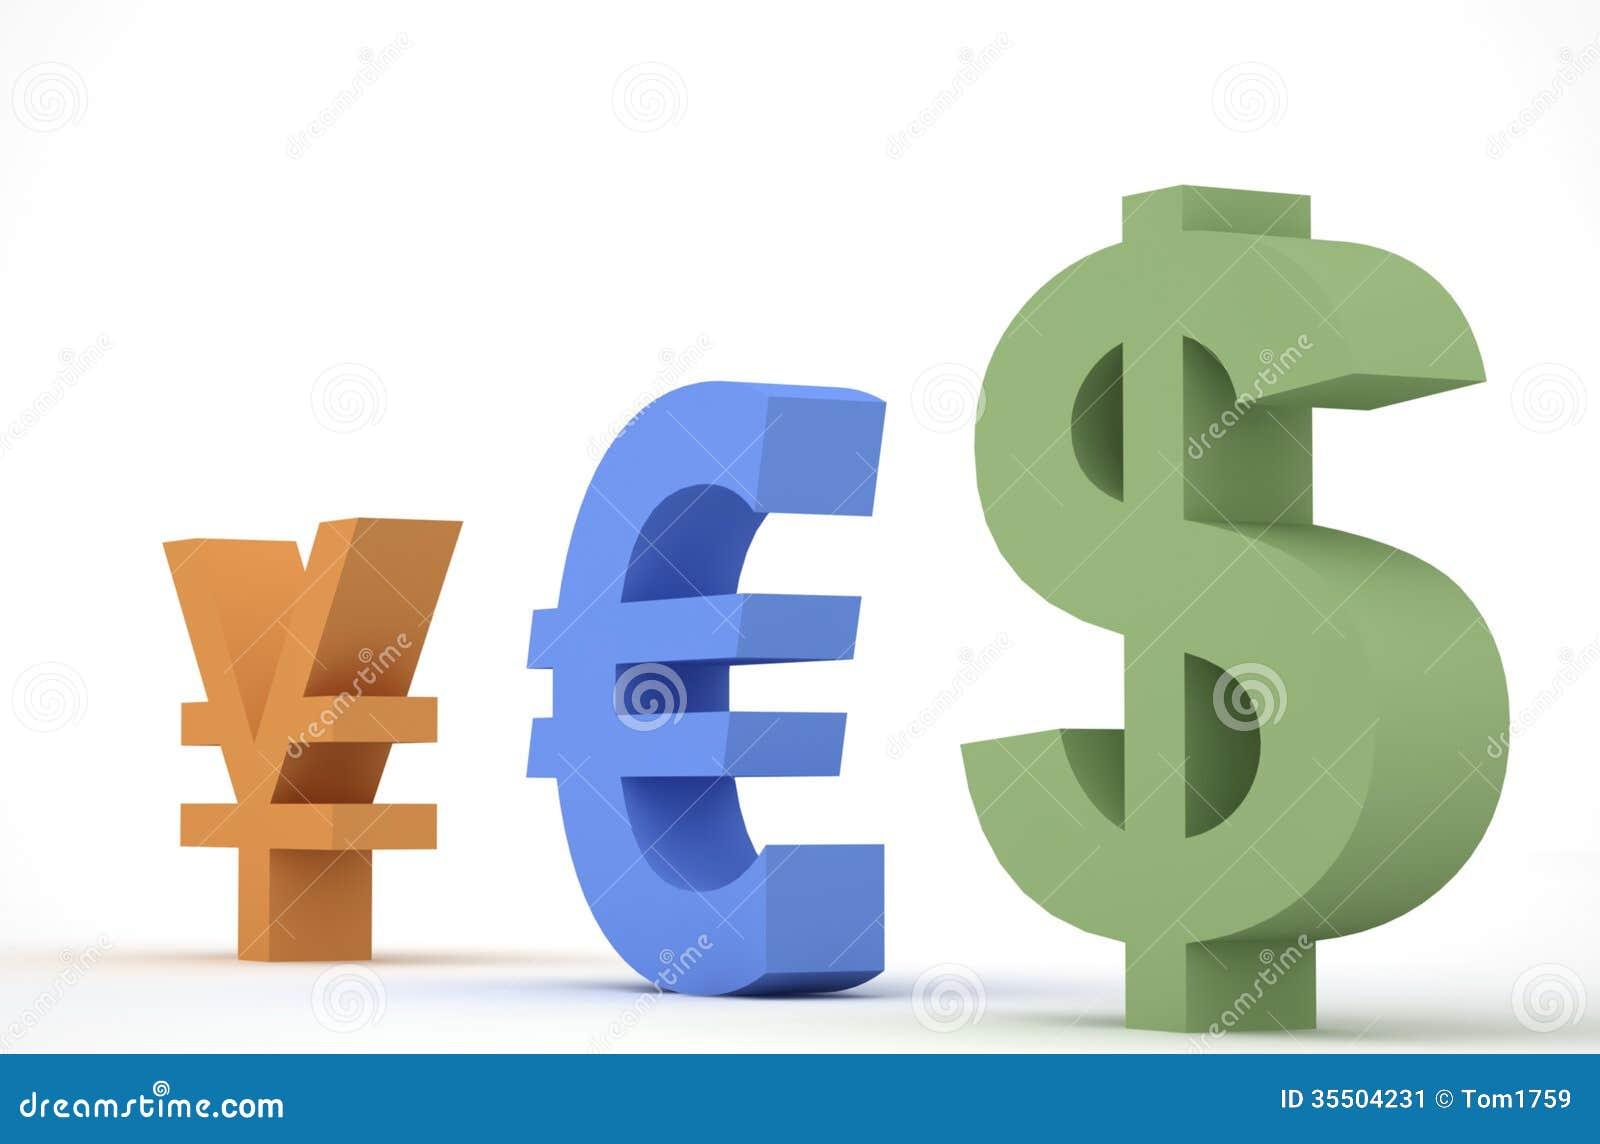 Rmb, Euro And Dollar Stock Image - Image: 35504231